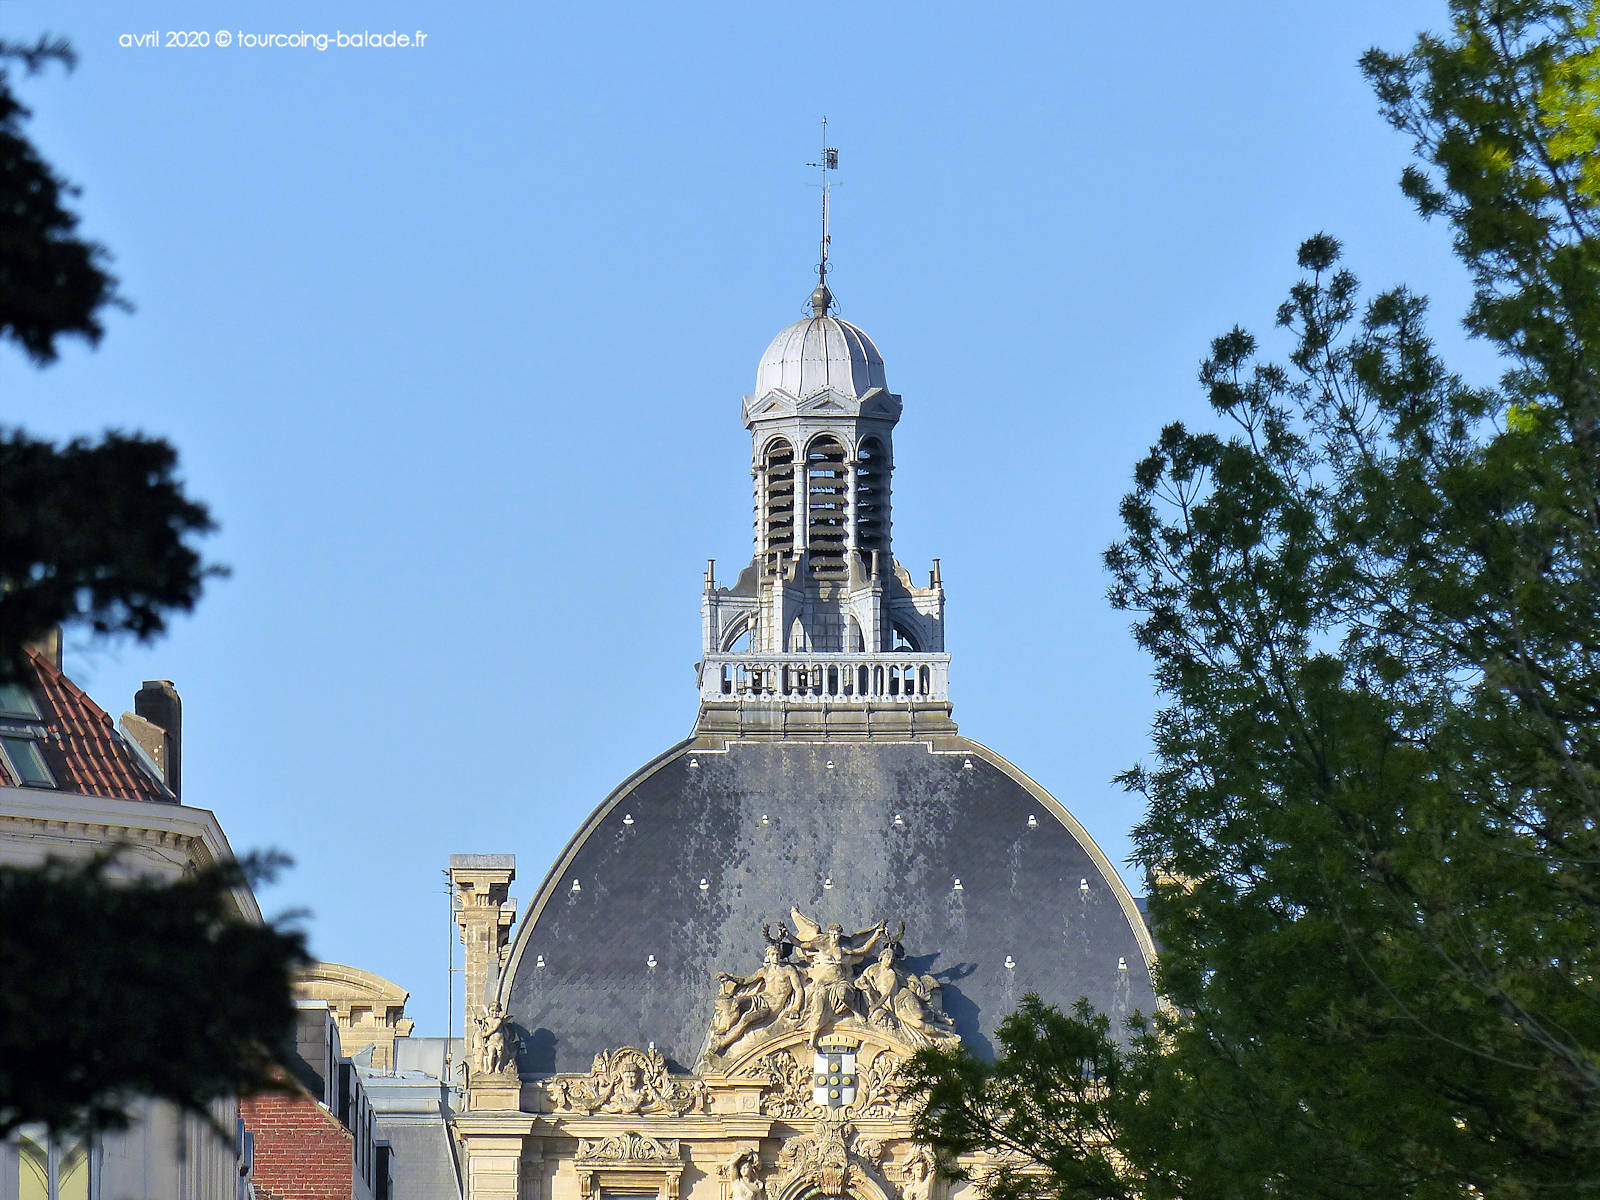 Mairie Tourcoing - Dôme et campanile - 2020